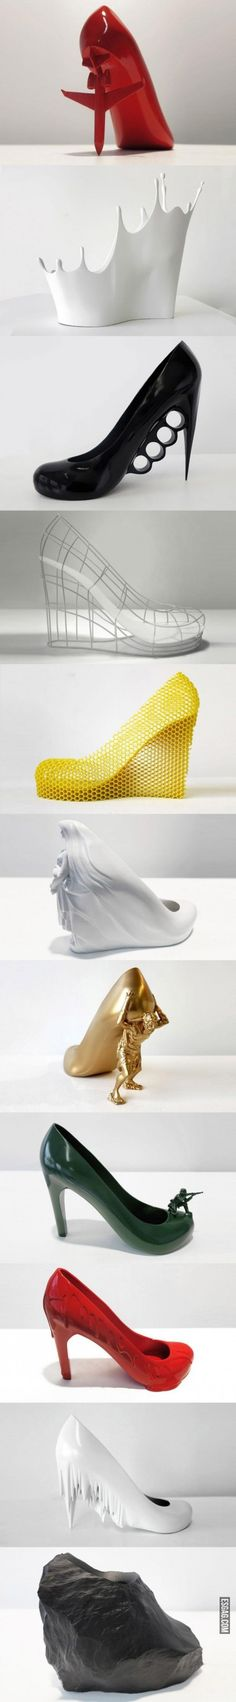 Increíbles diseños de zapatos de mujer - Find 150+ Top Online Shoe Stores via http://AmericasMall.com/categories/shoes.html